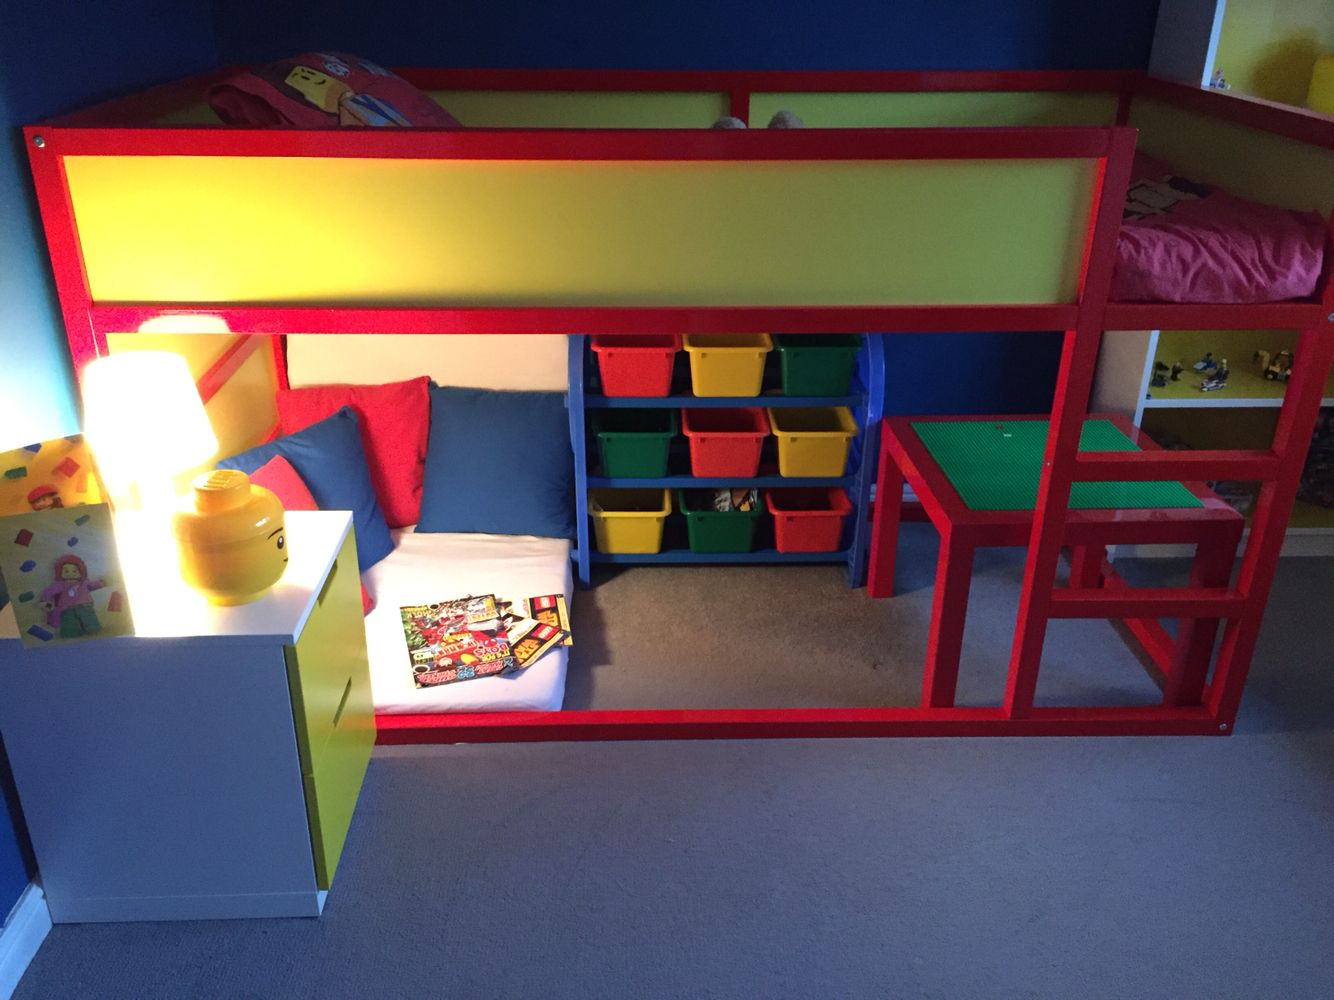 bedroom chair m&s restoring eames lounge lego completed ikea kura bed hack milo 39s room